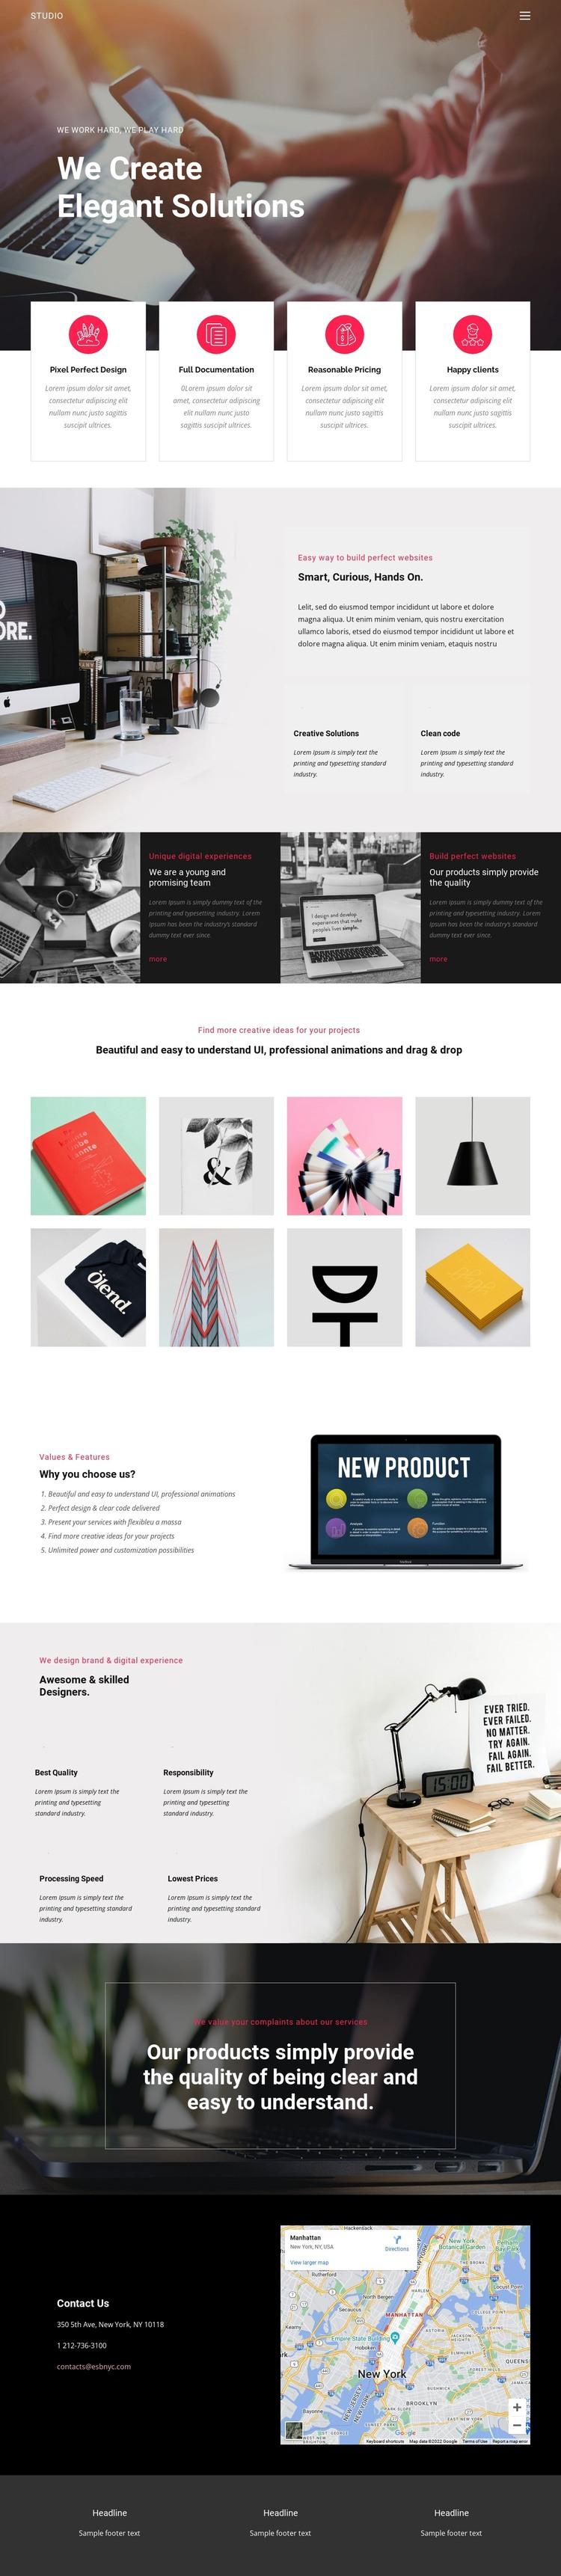 Elegant solutions in business  Web Design